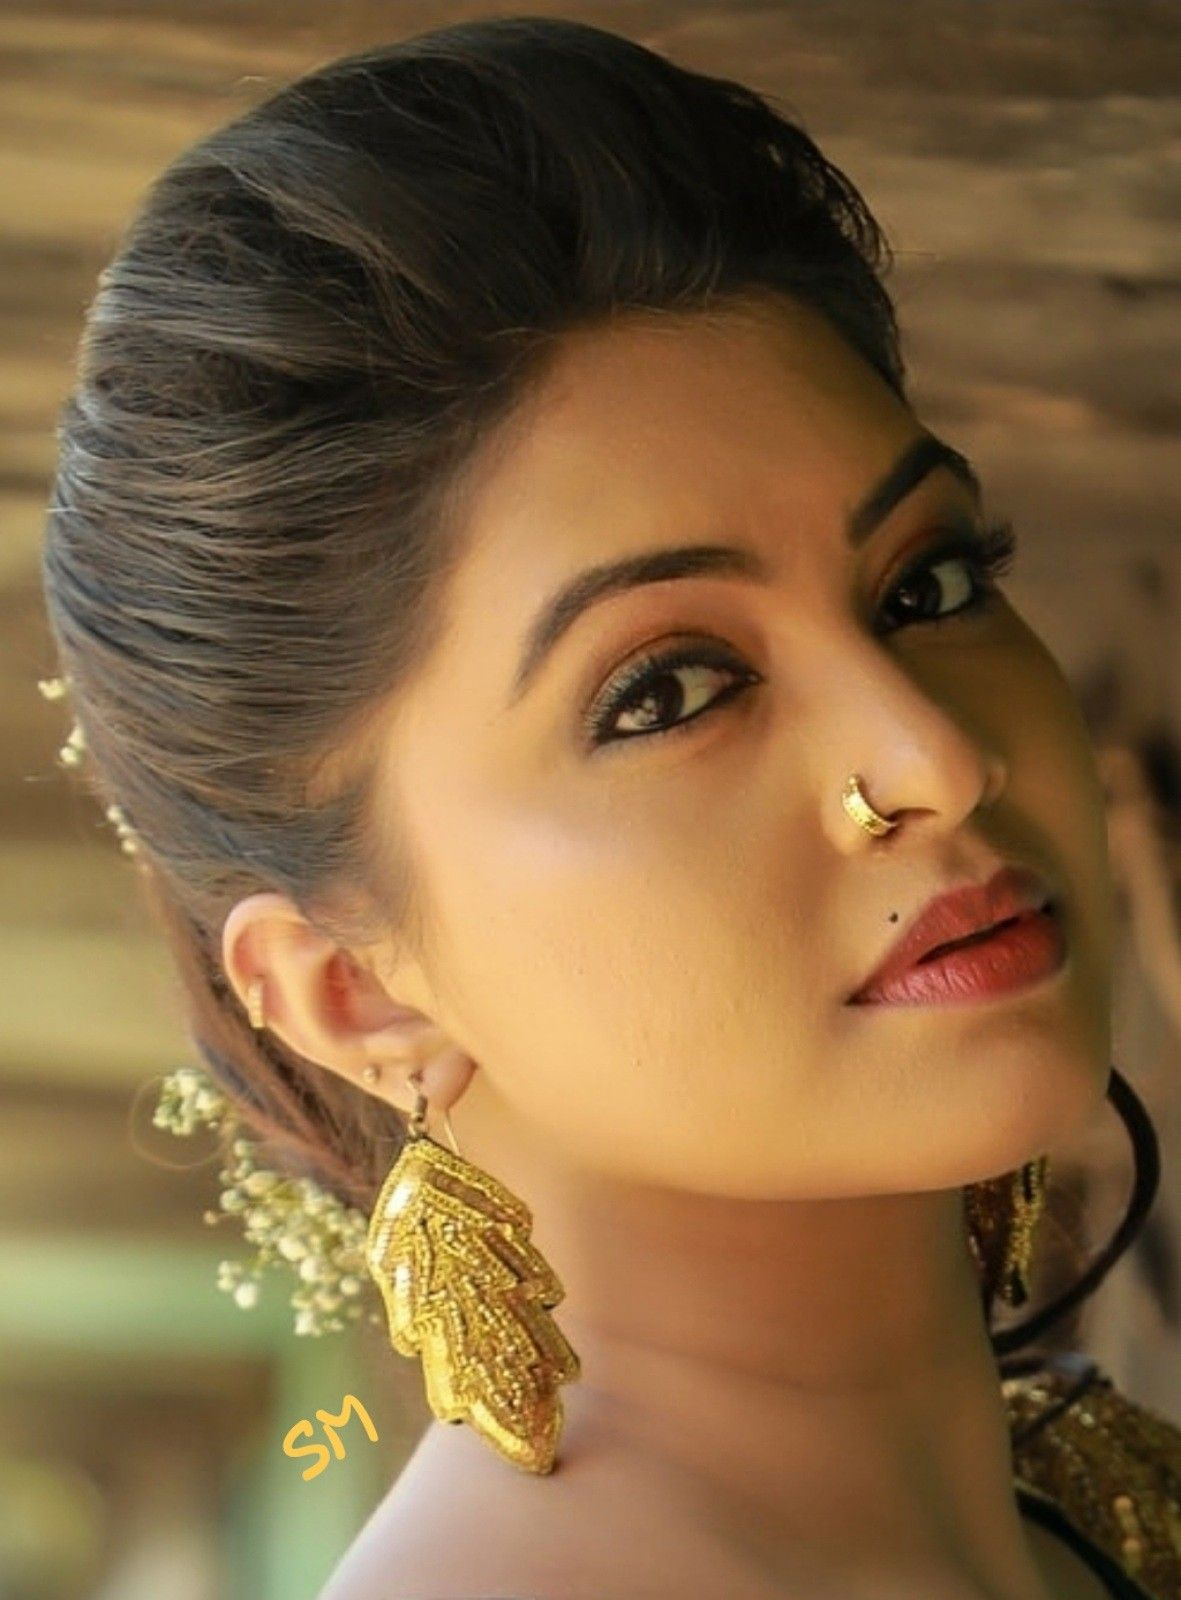 Rachitha Indian Long Hair Braid Beautiful Girl Indian